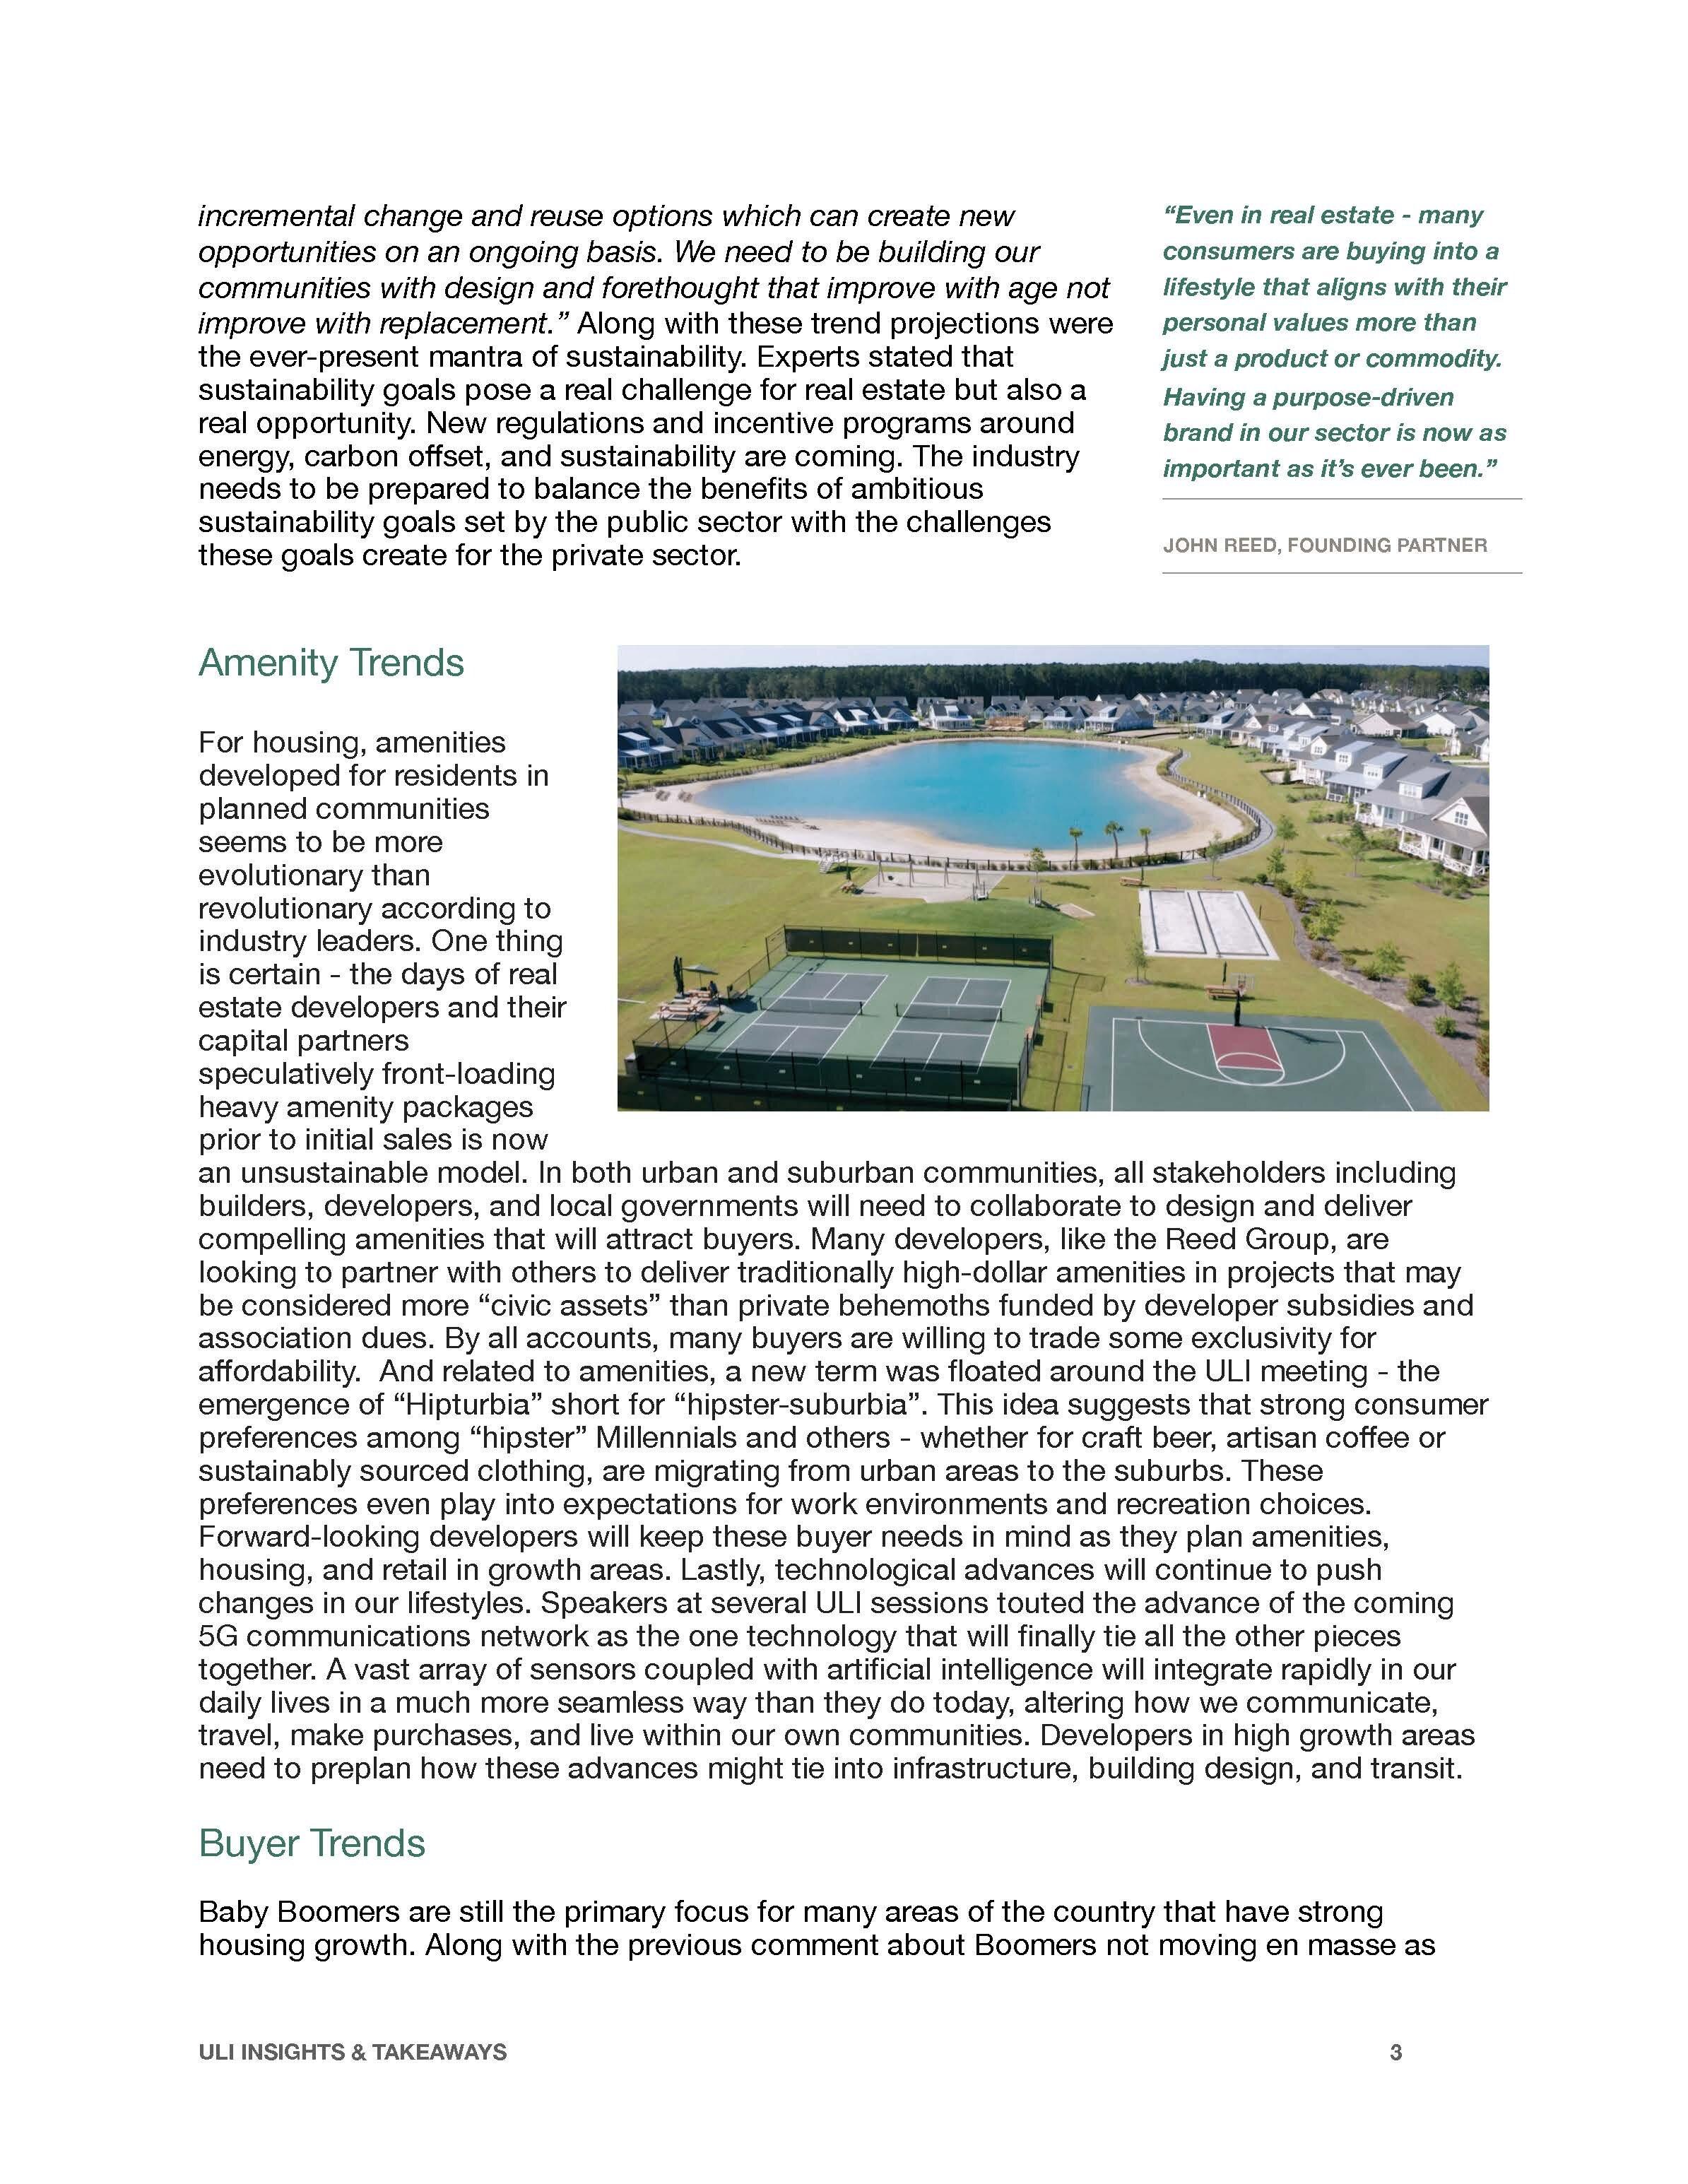 Reed Group - ULI INSIGHTS Fall 19 Final_Page_3.jpg